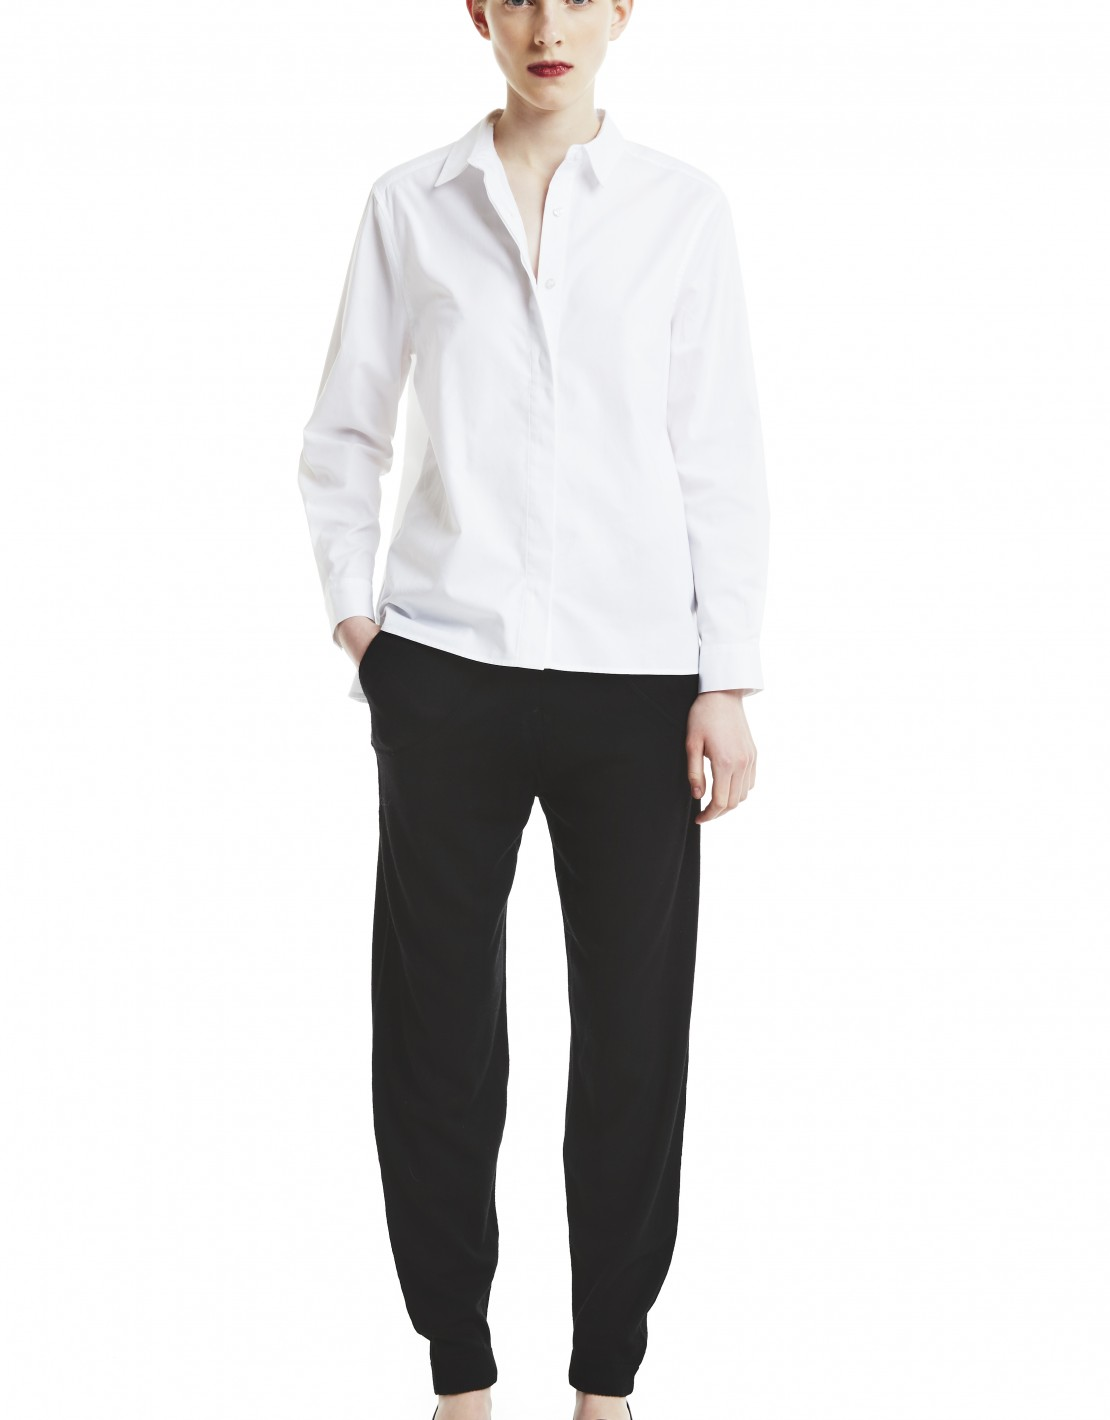 52-dagmar-belinda-shirt-amalia-trousers